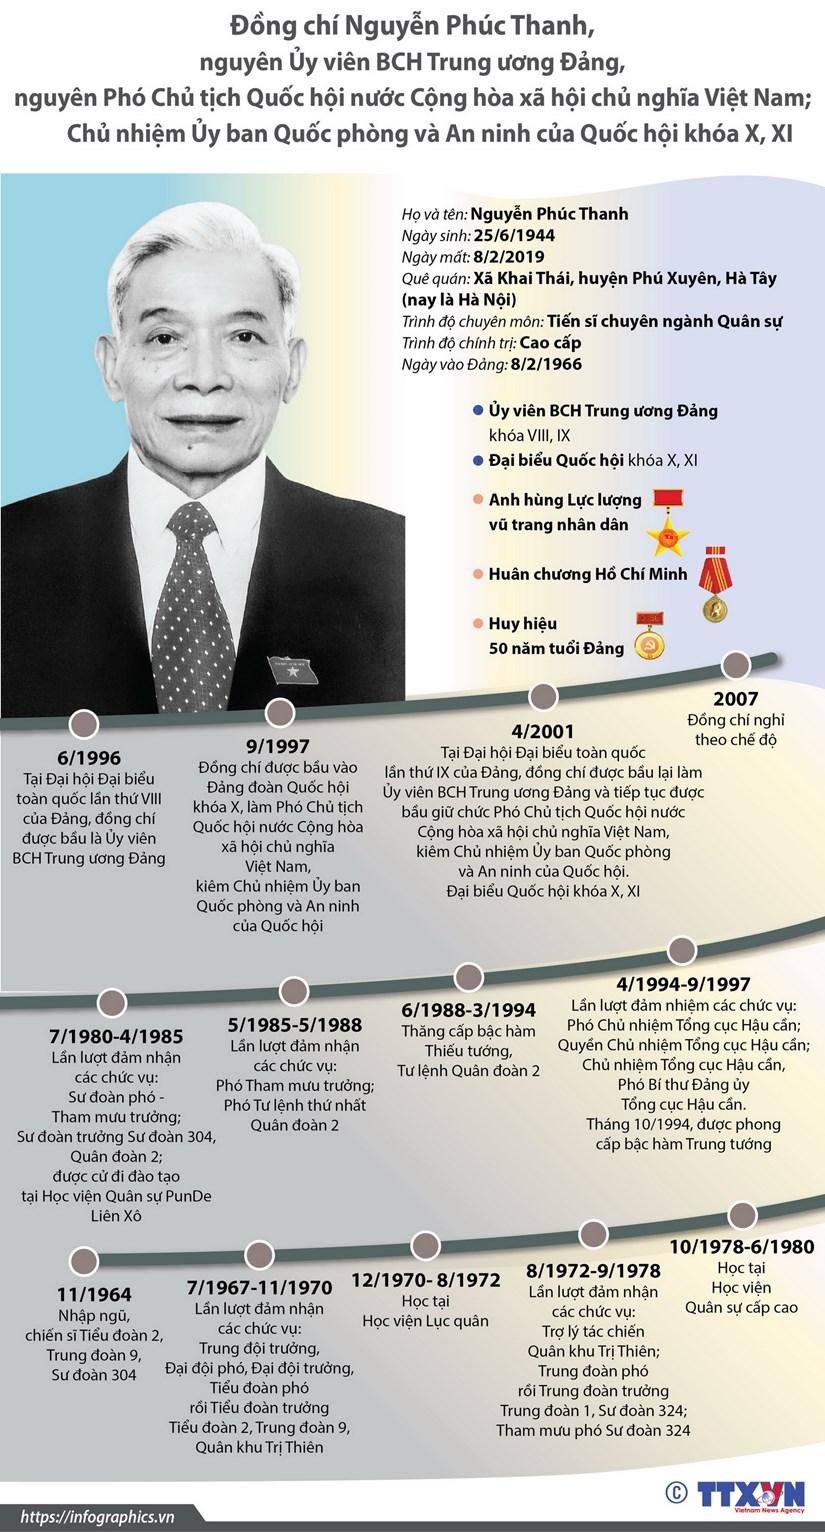 [Infographics] Qua trinh cong tac cua dong chi Nguyen Phuc Thanh hinh anh 1